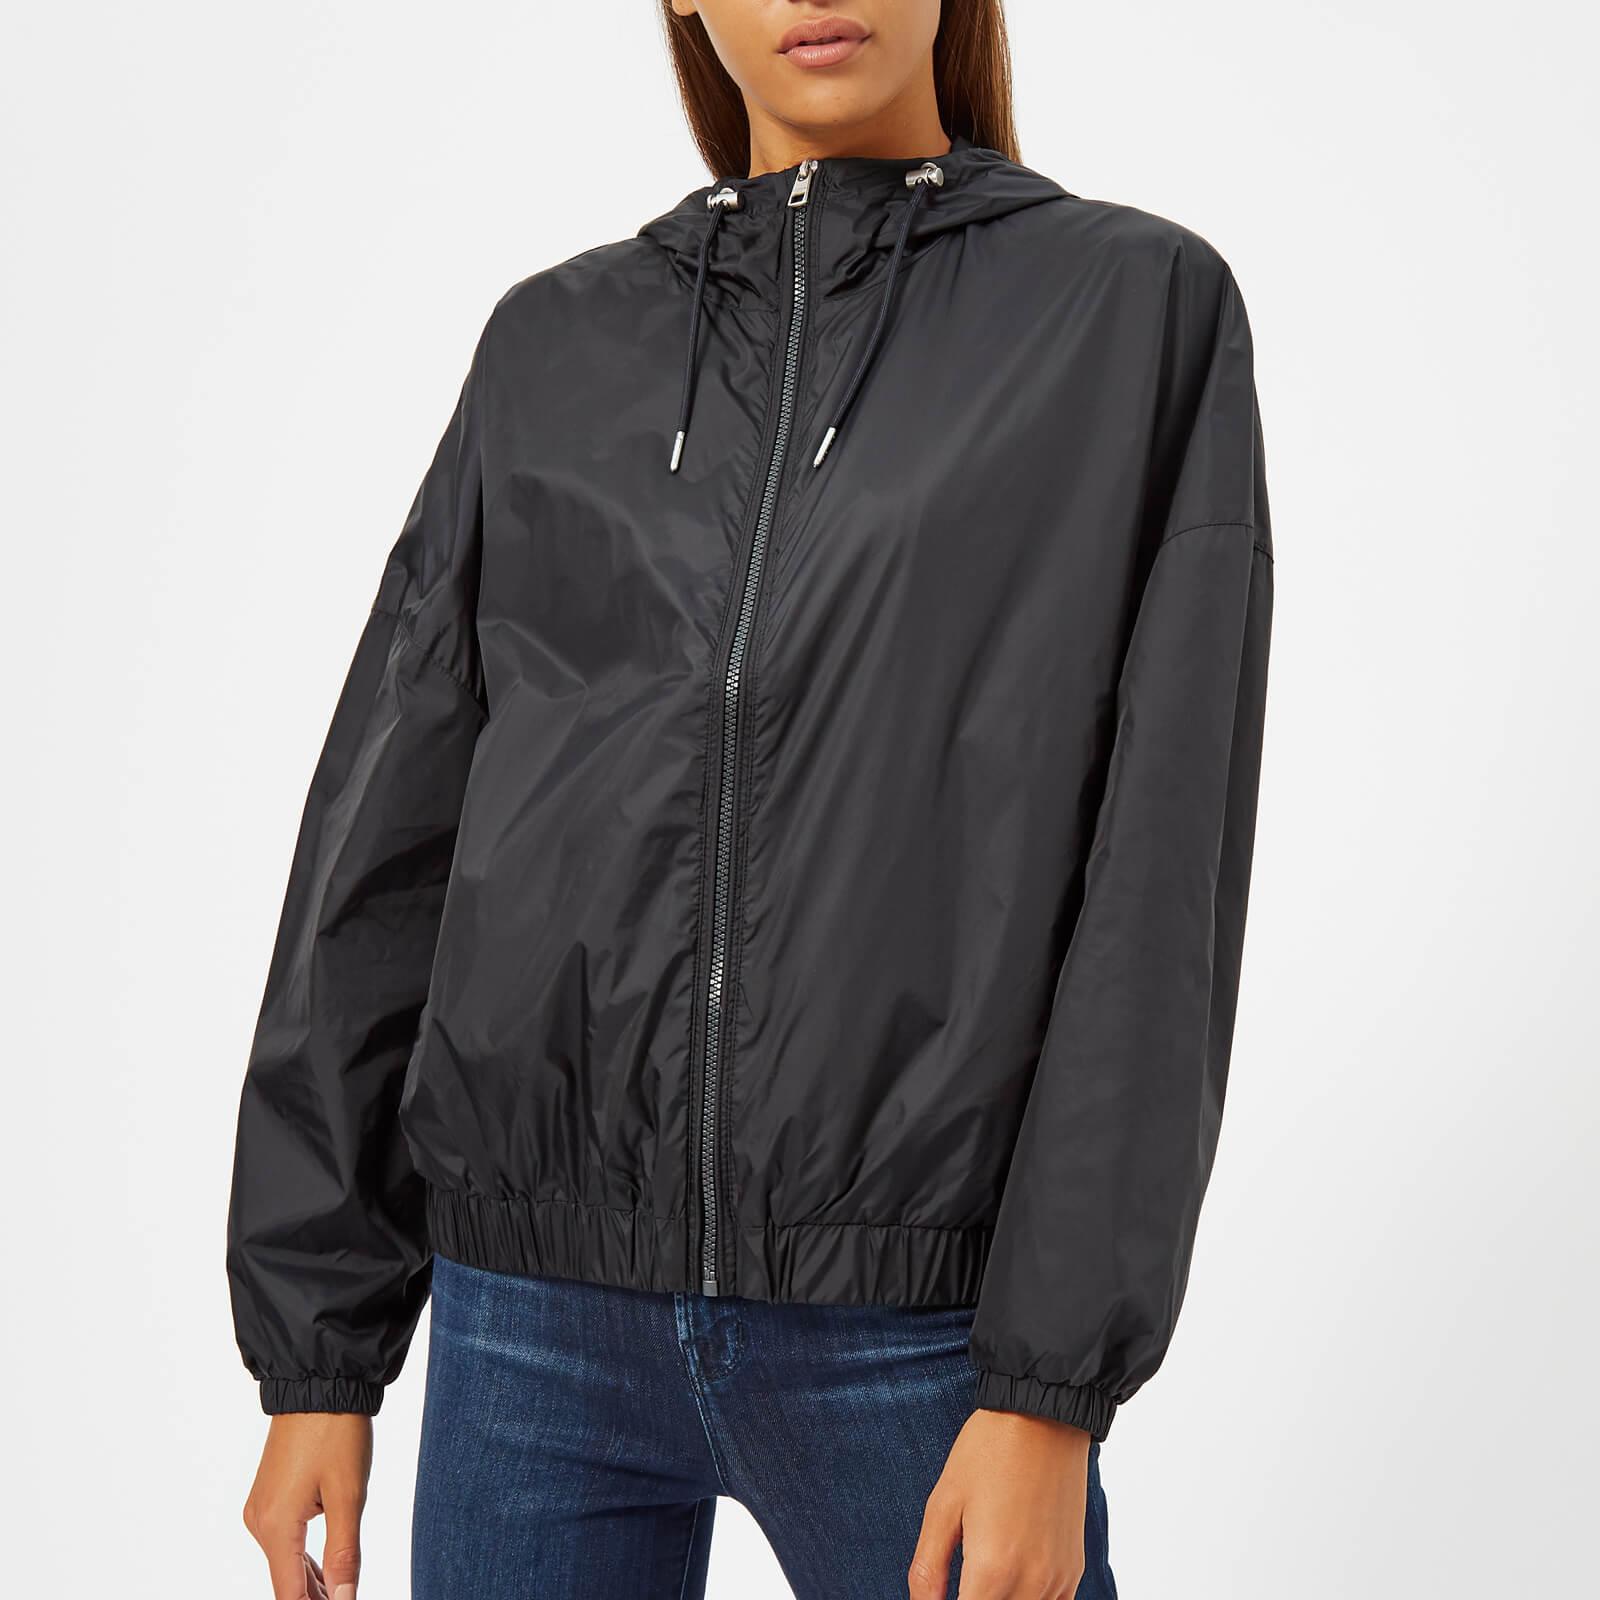 64ed478307d Calvin Klein Jeans Women s Hooded Zip Up Windbreaker Jacket - CK Black  Womens Clothing